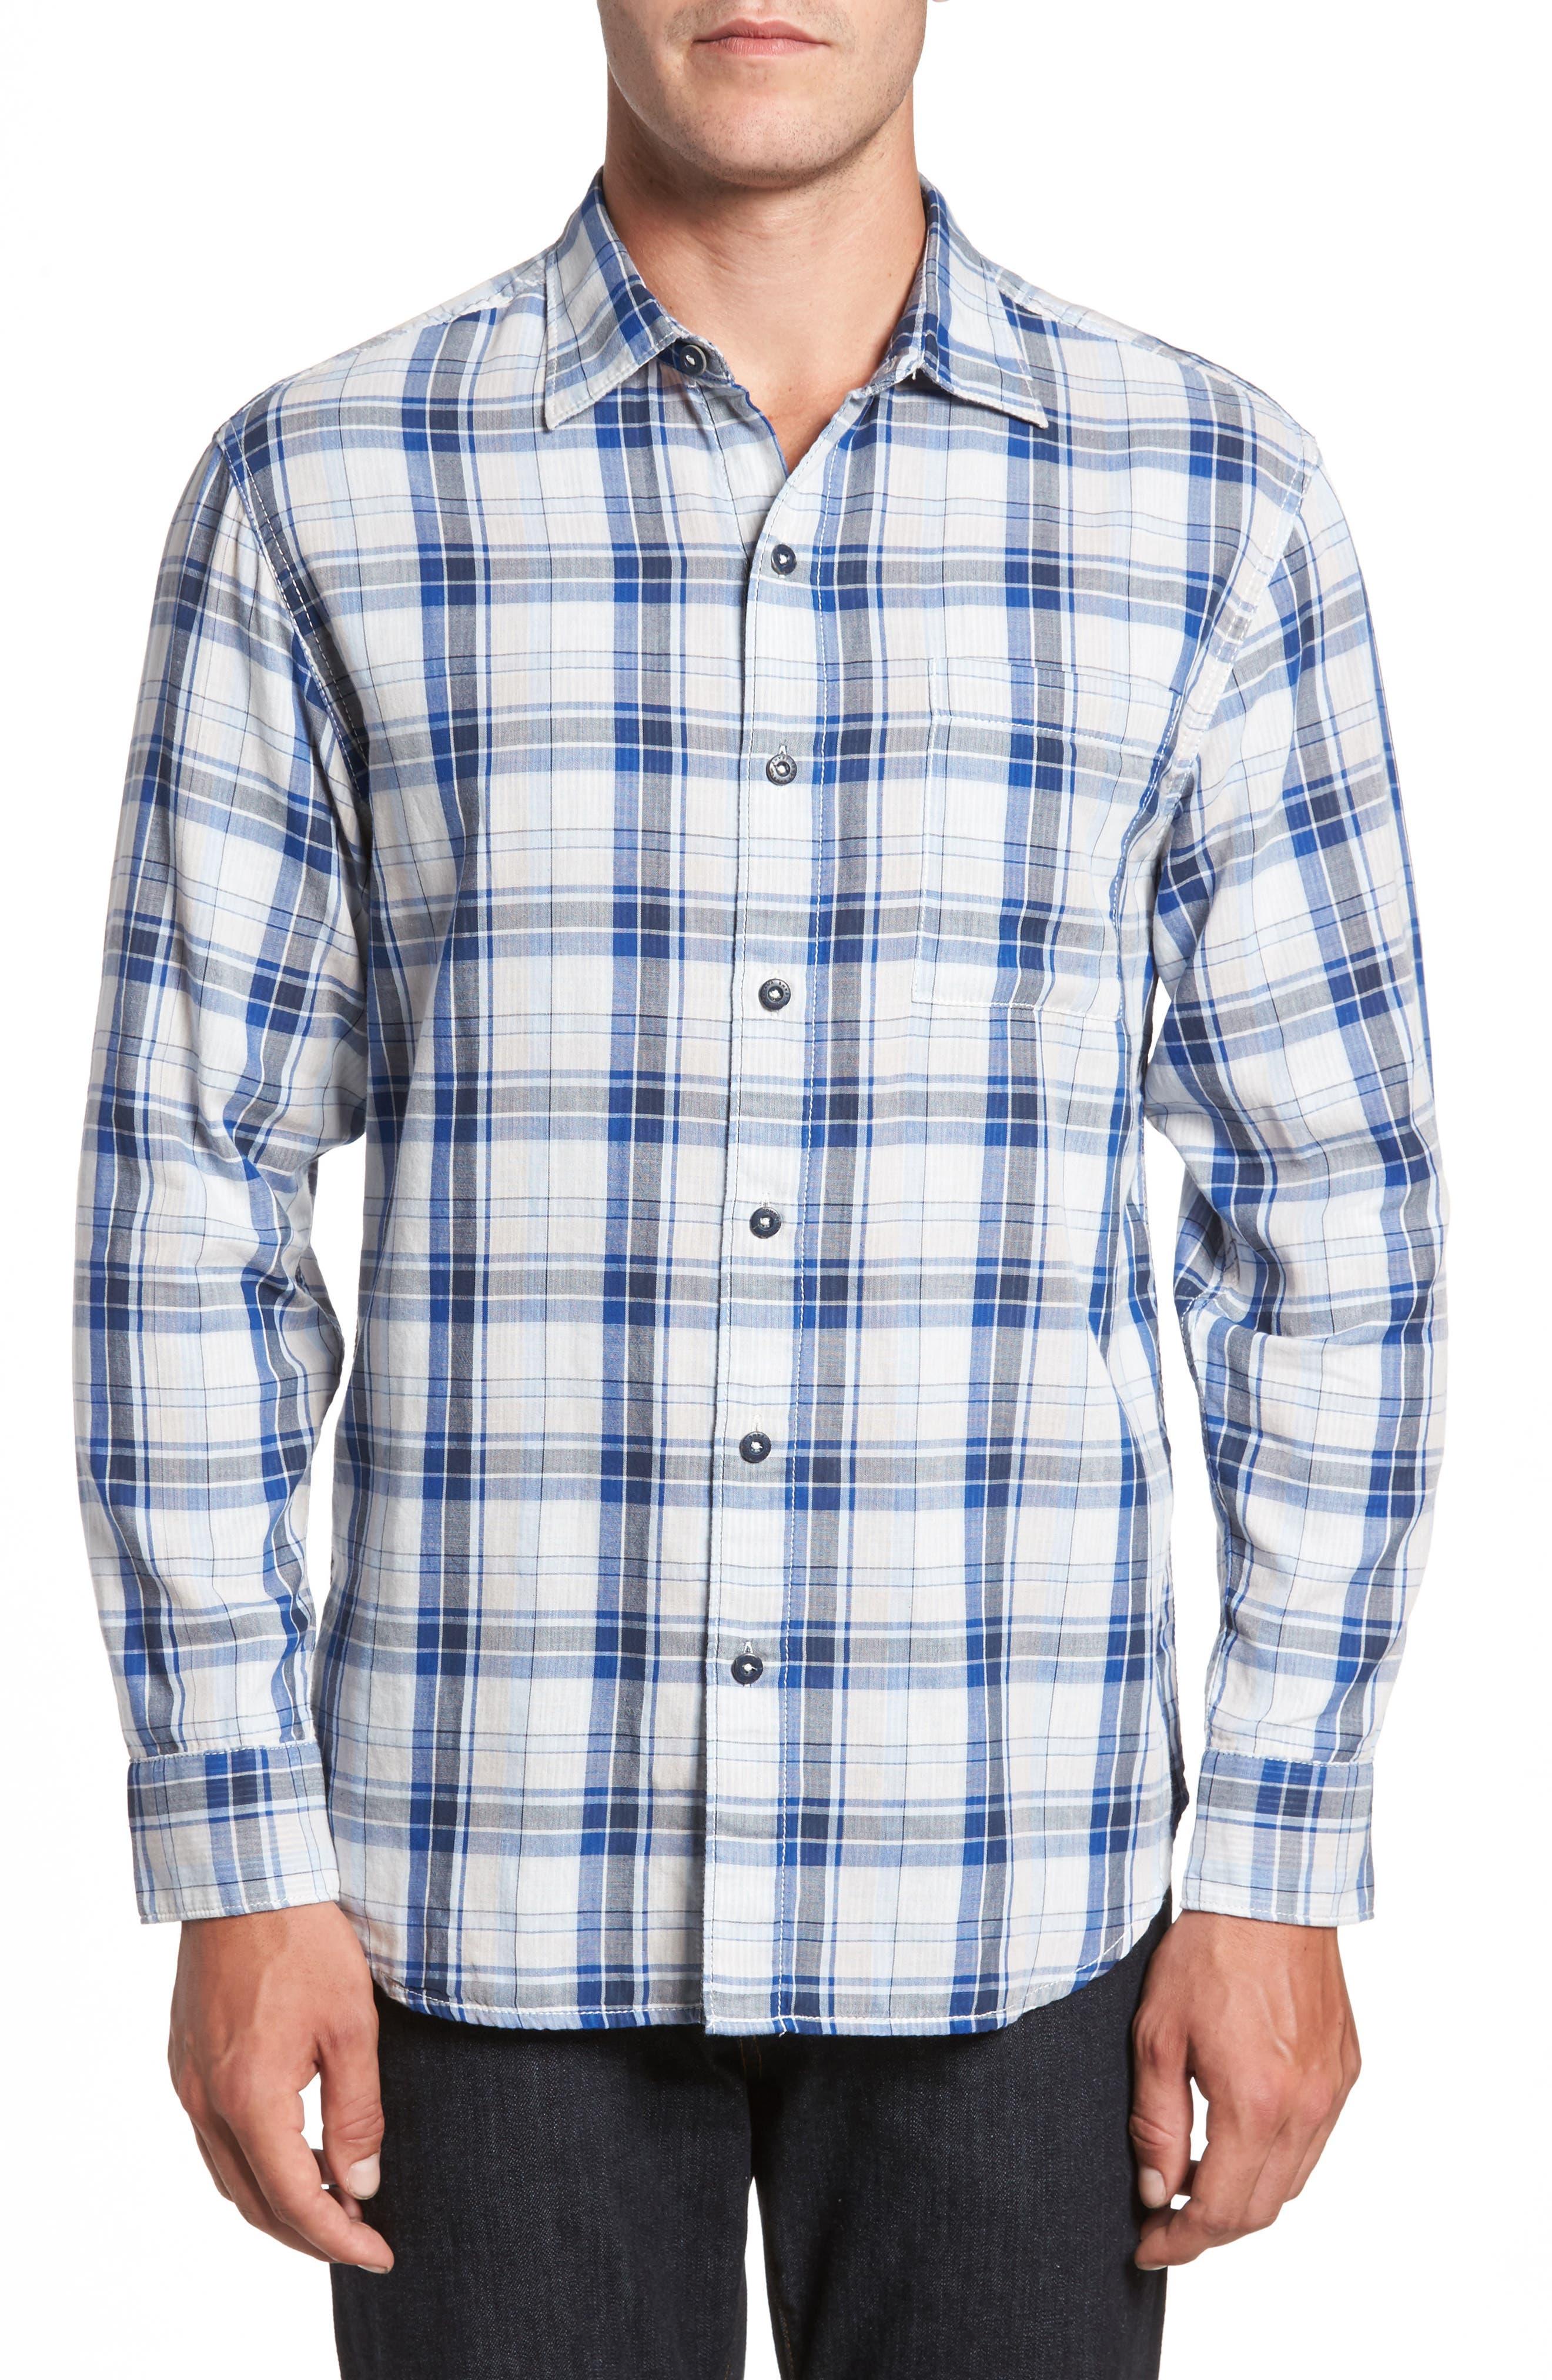 Main Image - Tommy Bahama Aladdin Standard Fit Plaid Sport Shirt